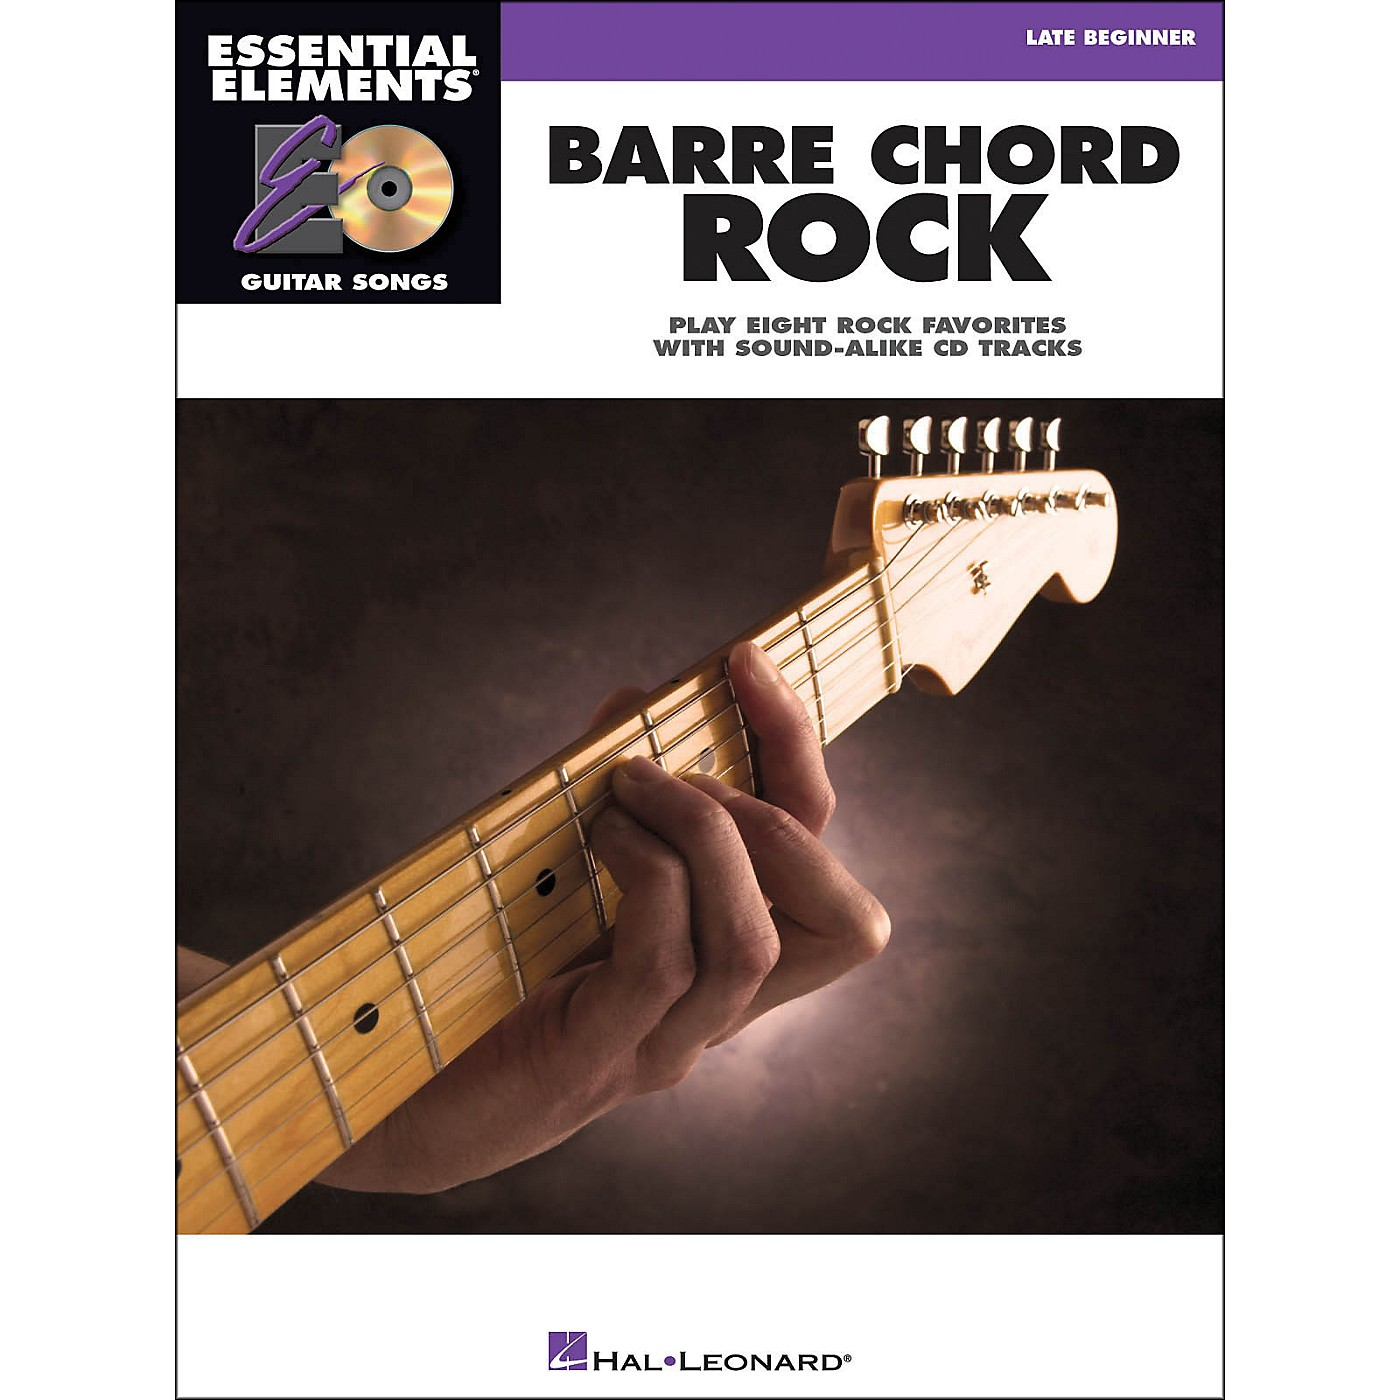 Hal Leonard Barre Chord Rock Essential Elements Guitar Songs Book/CD Late Beginner thumbnail